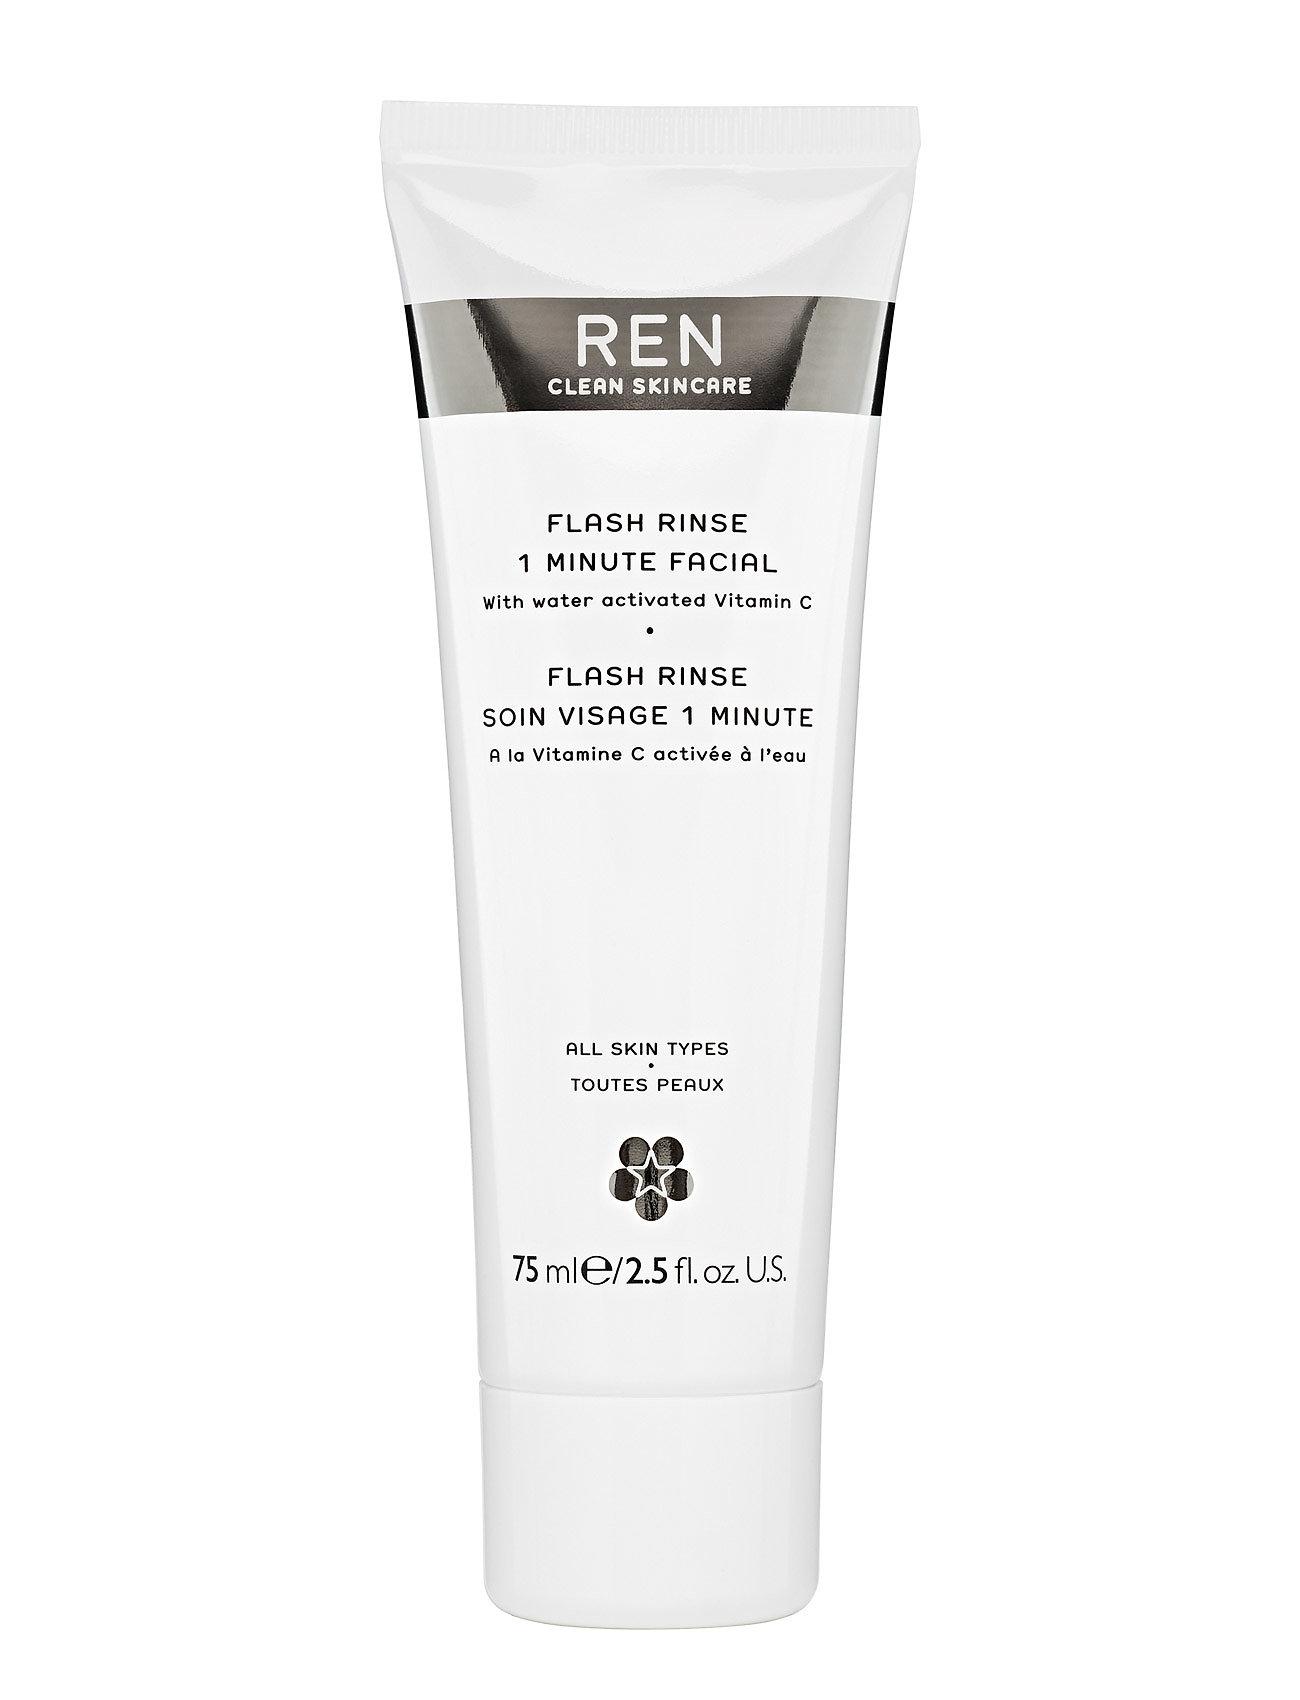 Image of Flash Rinse 1 Minute Facial Beauty WOMEN Skin Care Face Peelings Nude REN (3111060663)